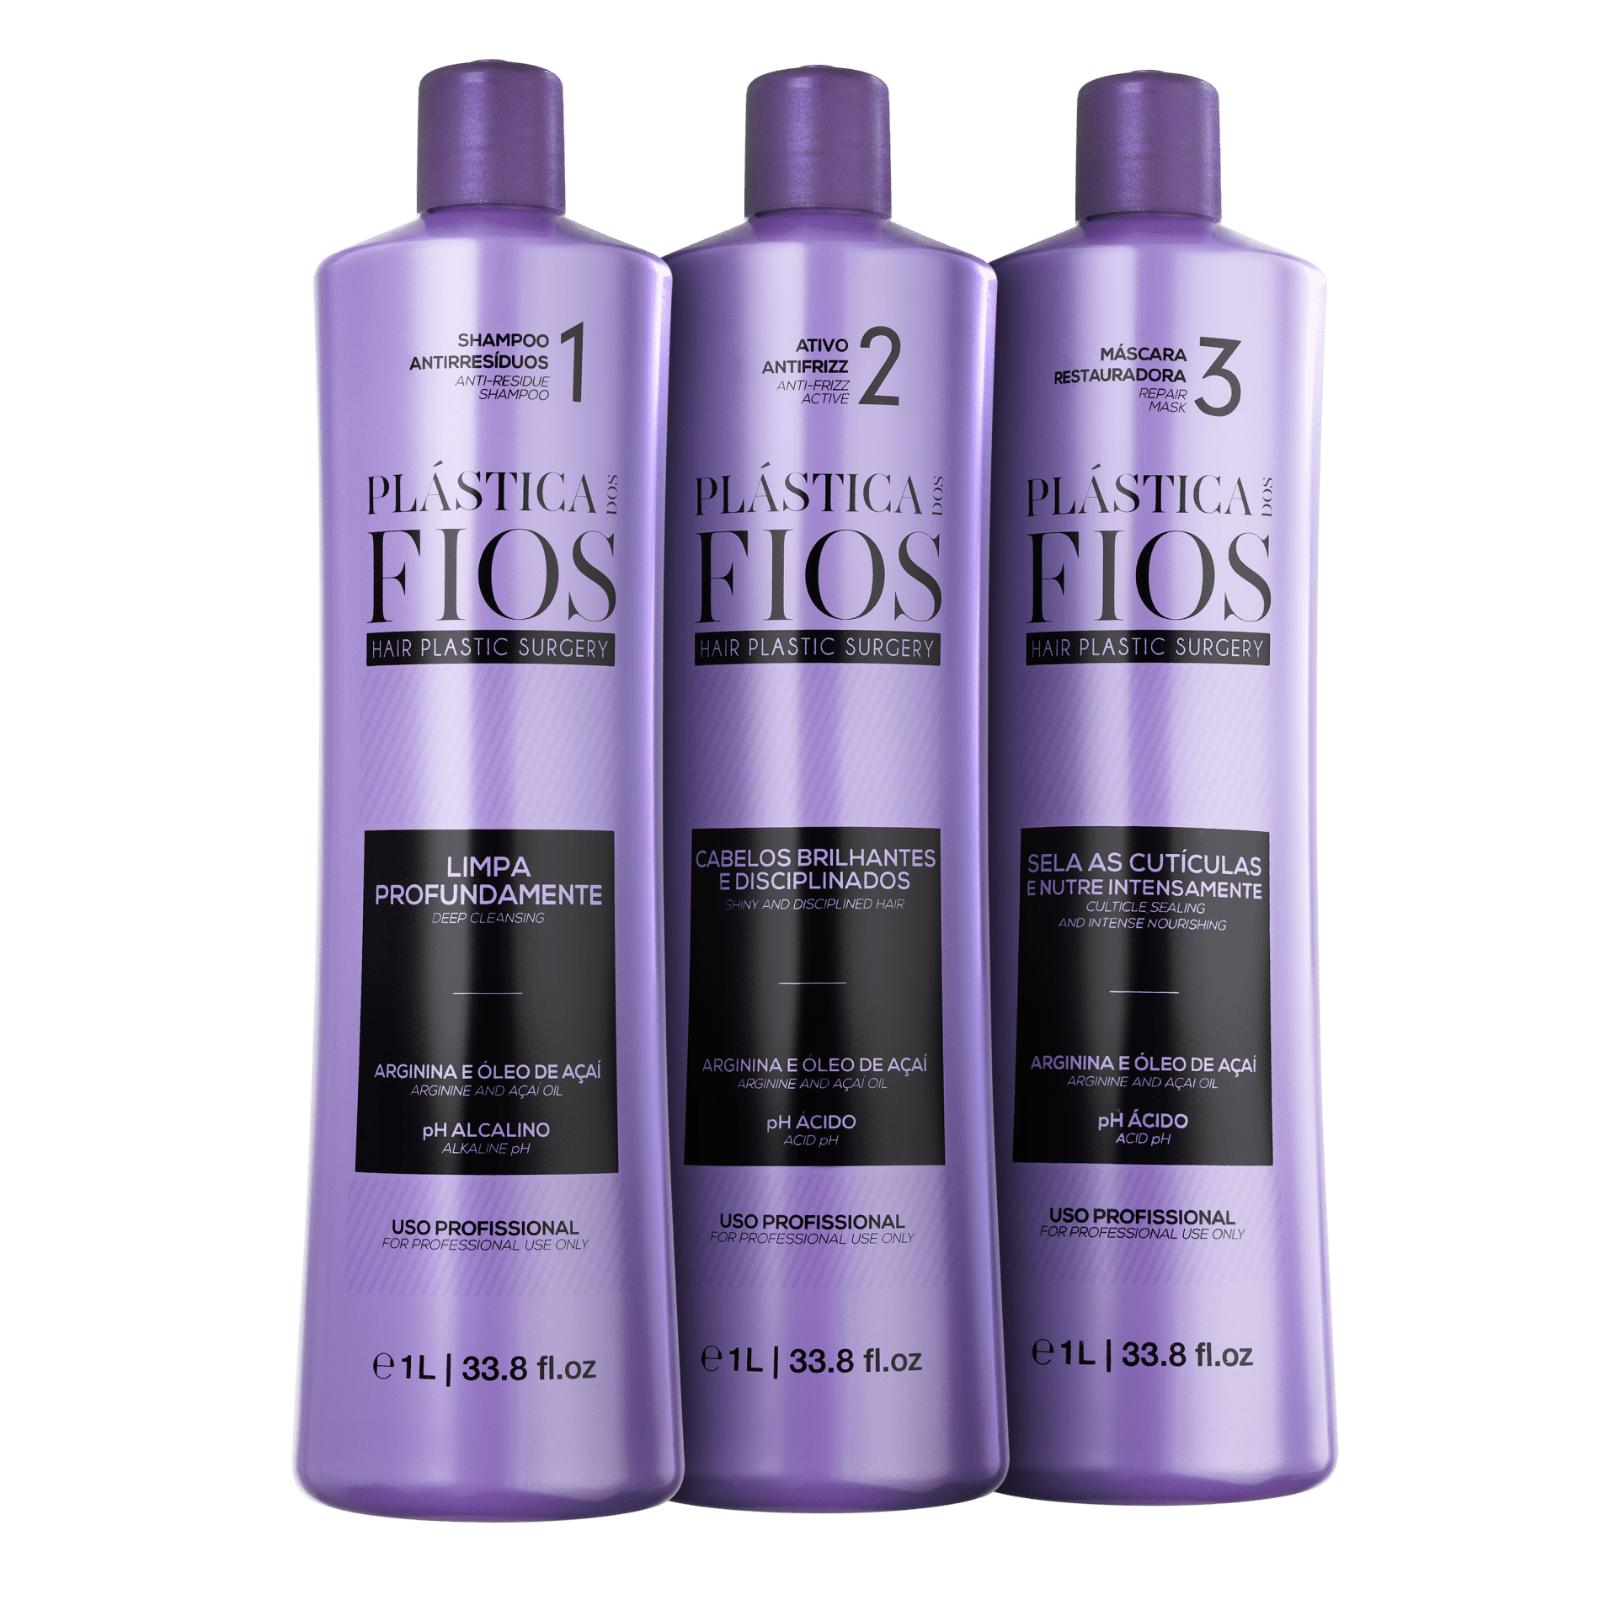 Plastica Dos Fios 3x1000ml Brazilian Keratin Treatment - Cad